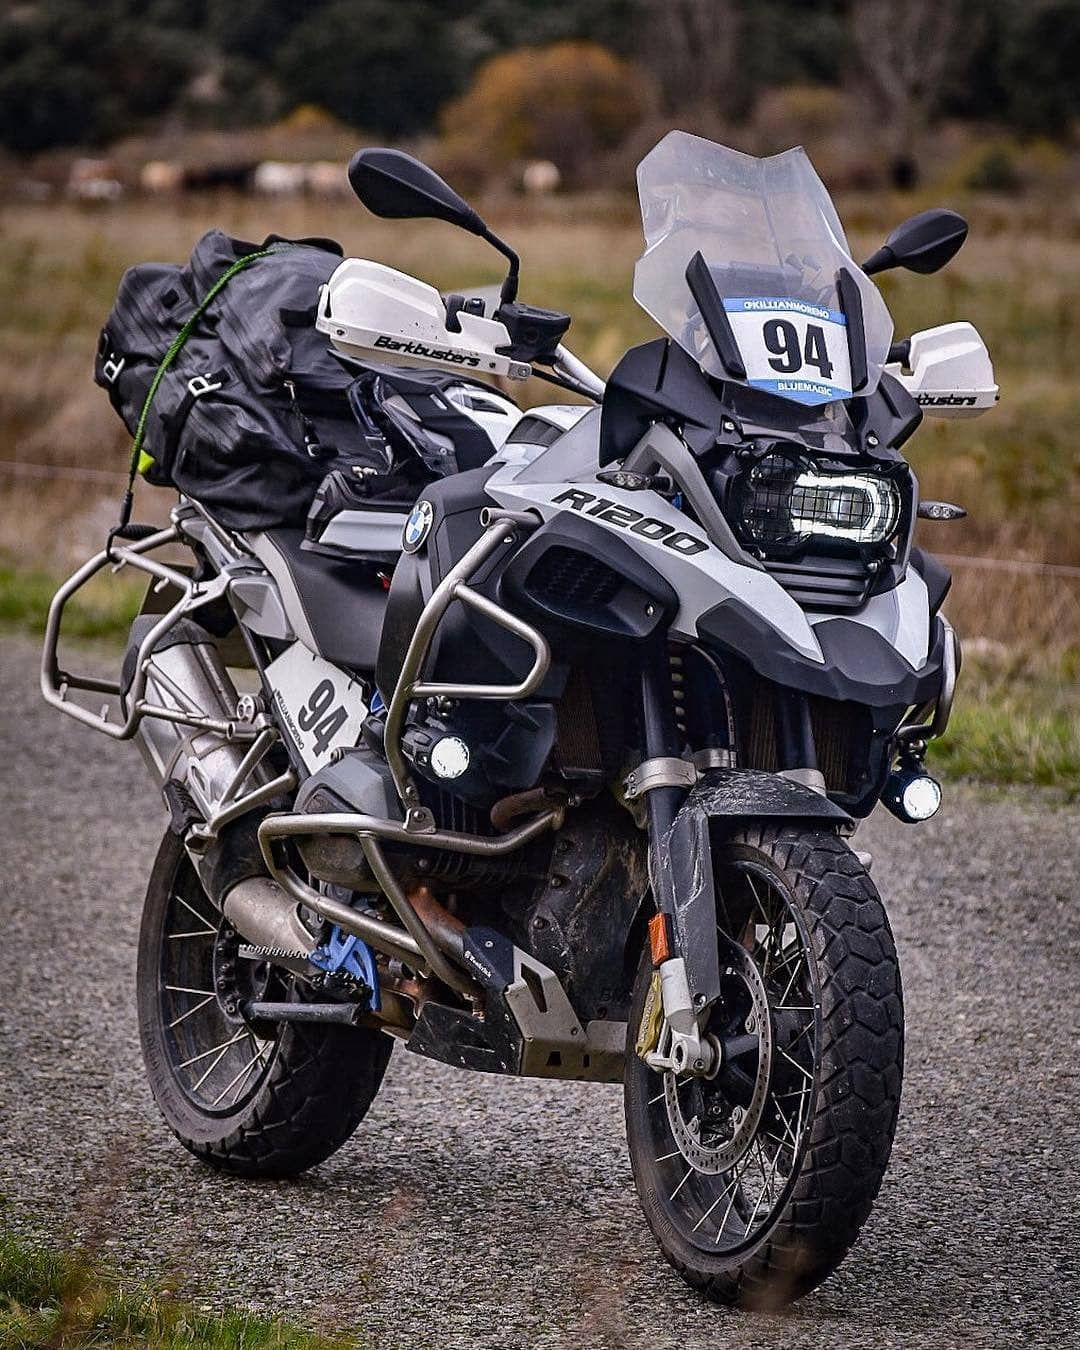 120 Bmw R1200 Gs Adventure Ideen Bmw Motorrad Motorrad Bmw